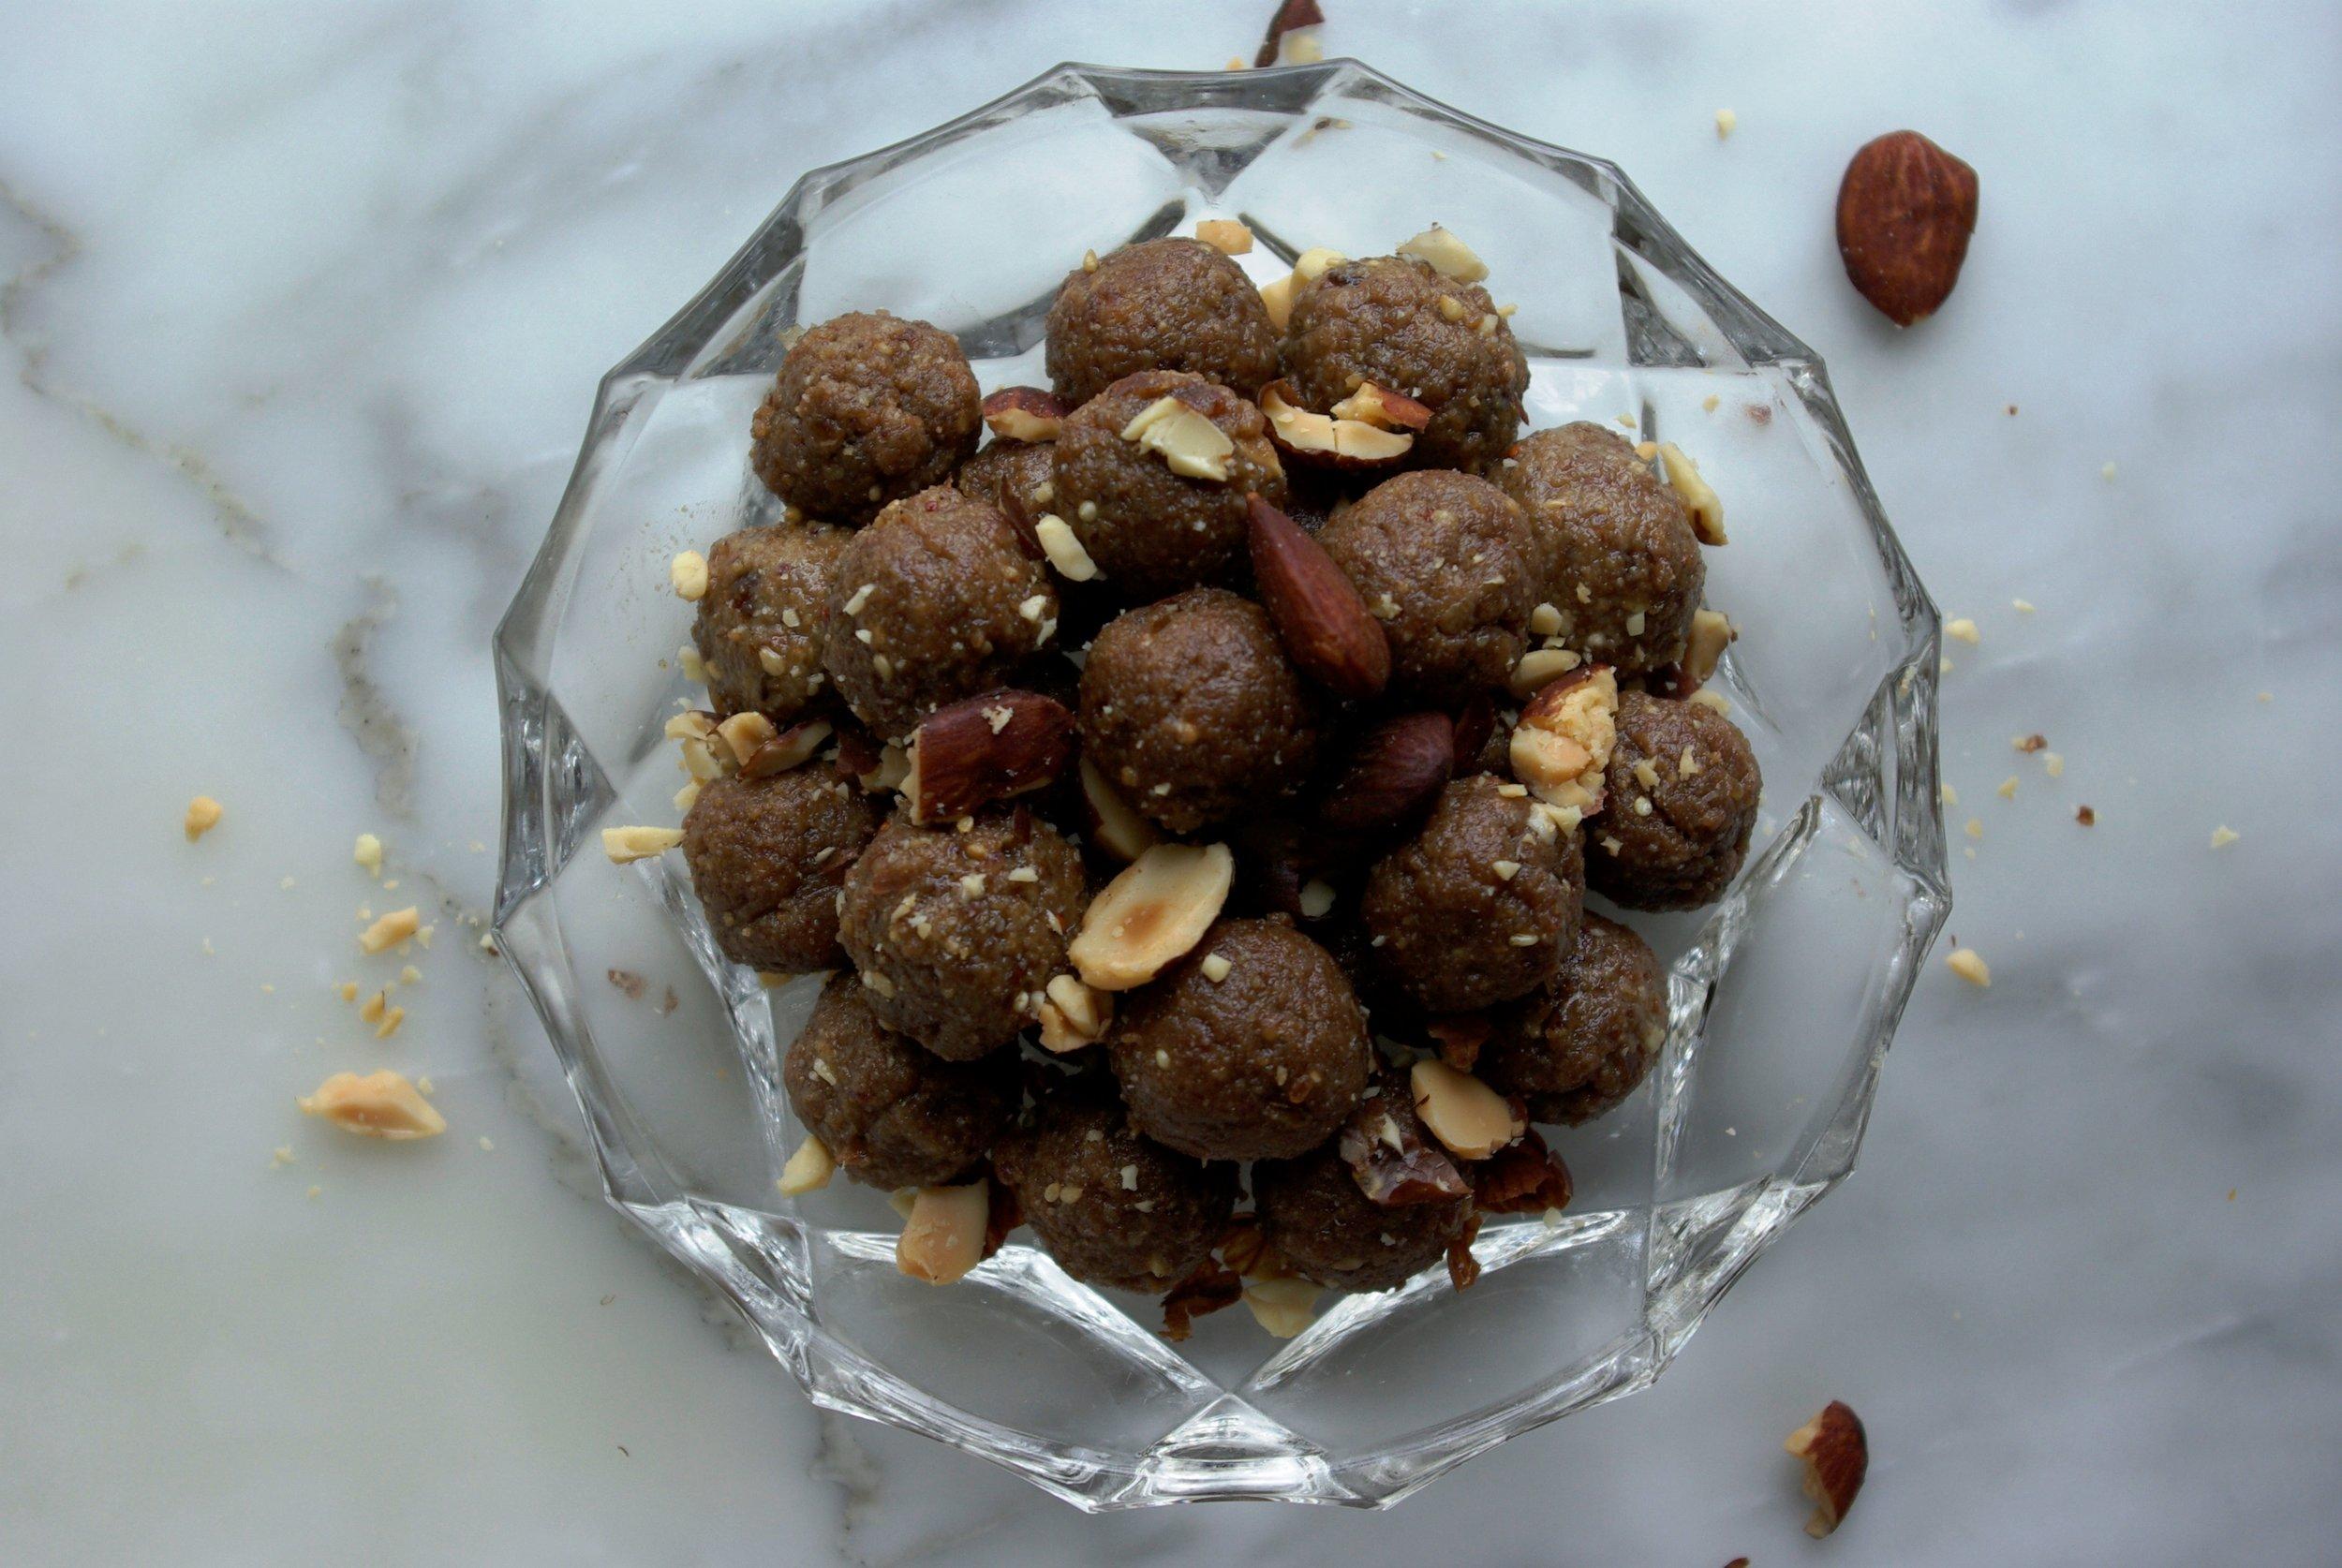 Almond Energy Balls Bites The Beauty of Simplicity by Salwa Petersen.jpg